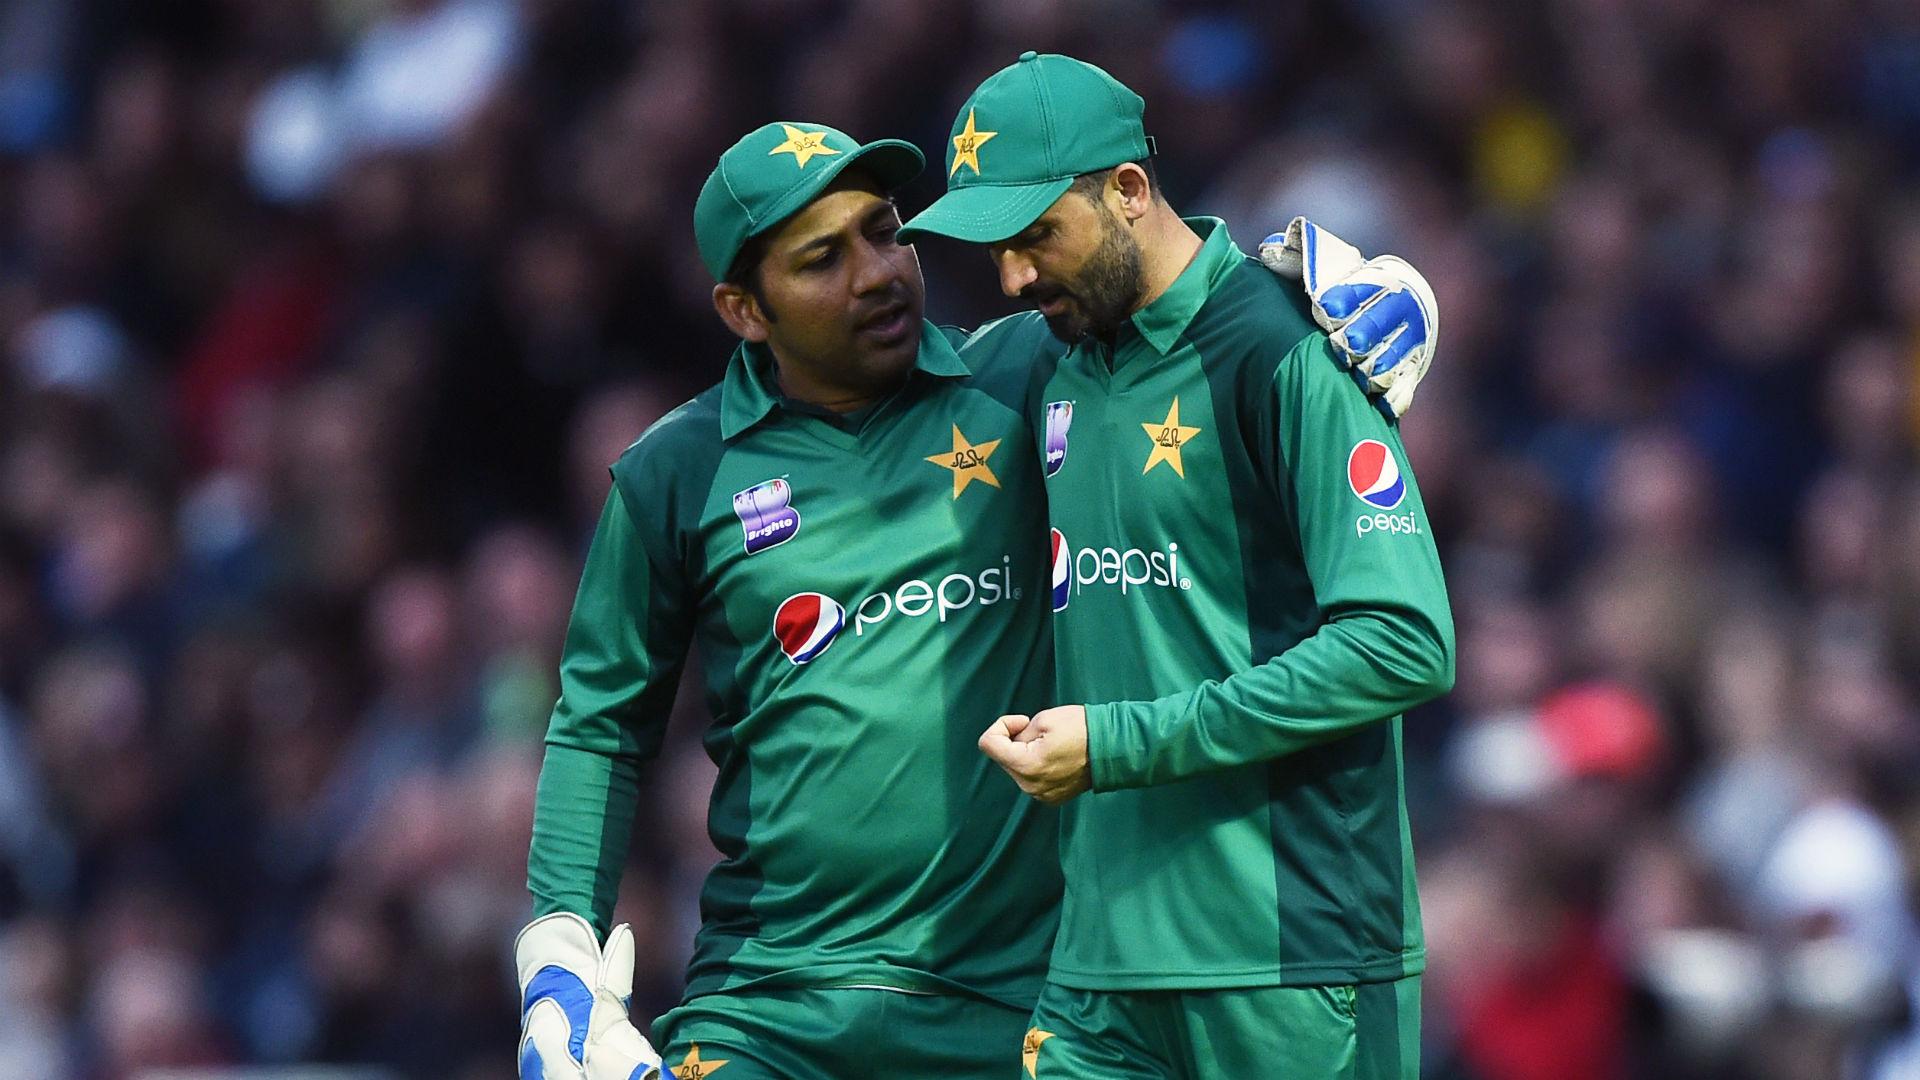 Sarfraz: Pakistan must improve in the field